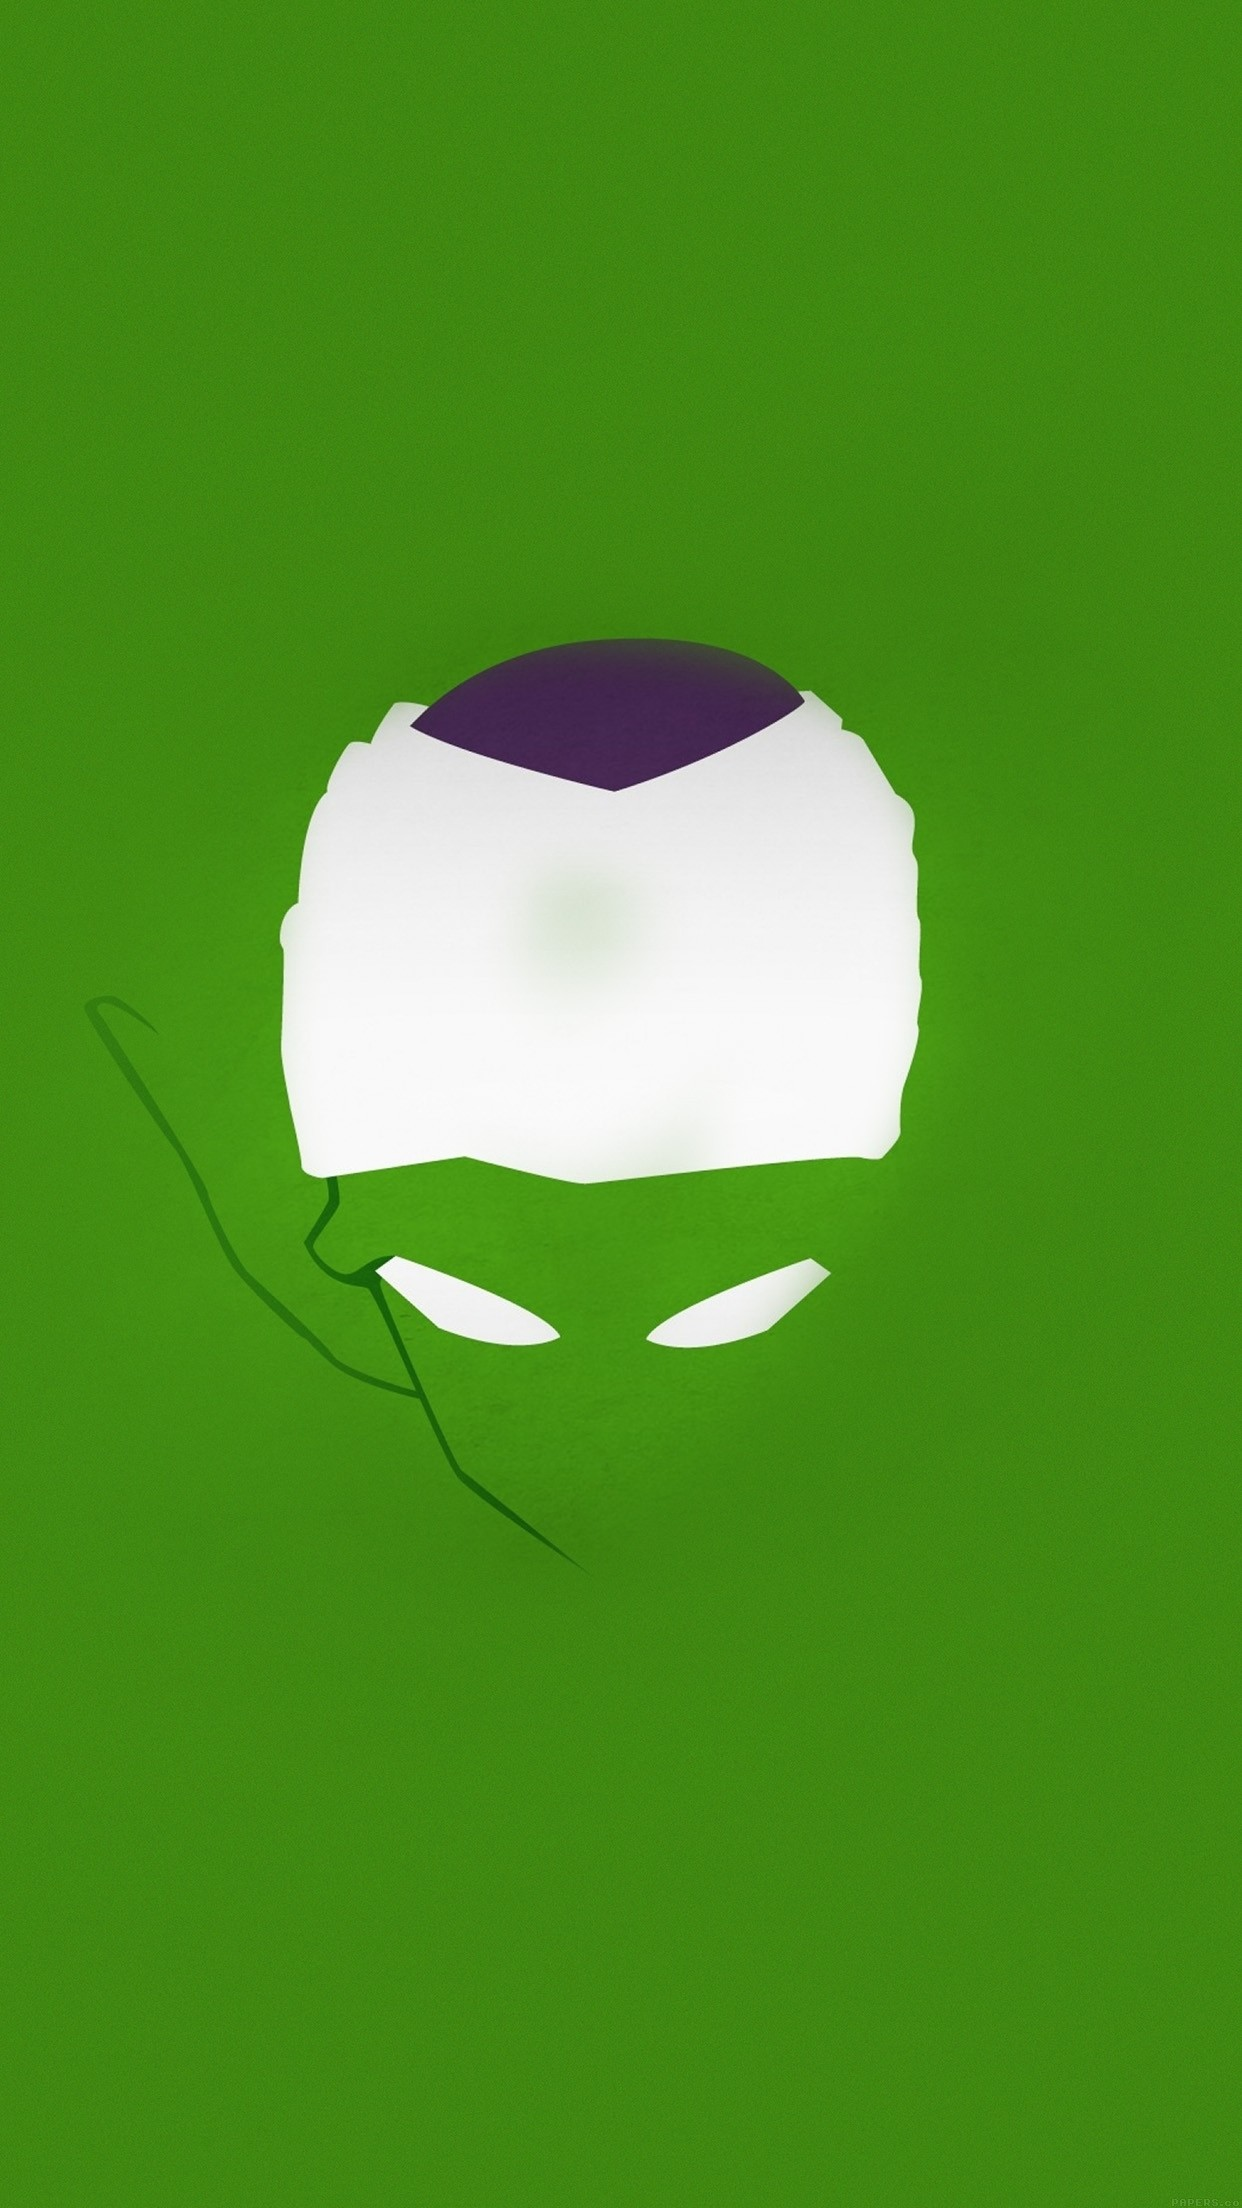 Dragonball Z Piccolo Illust Minimal Simple